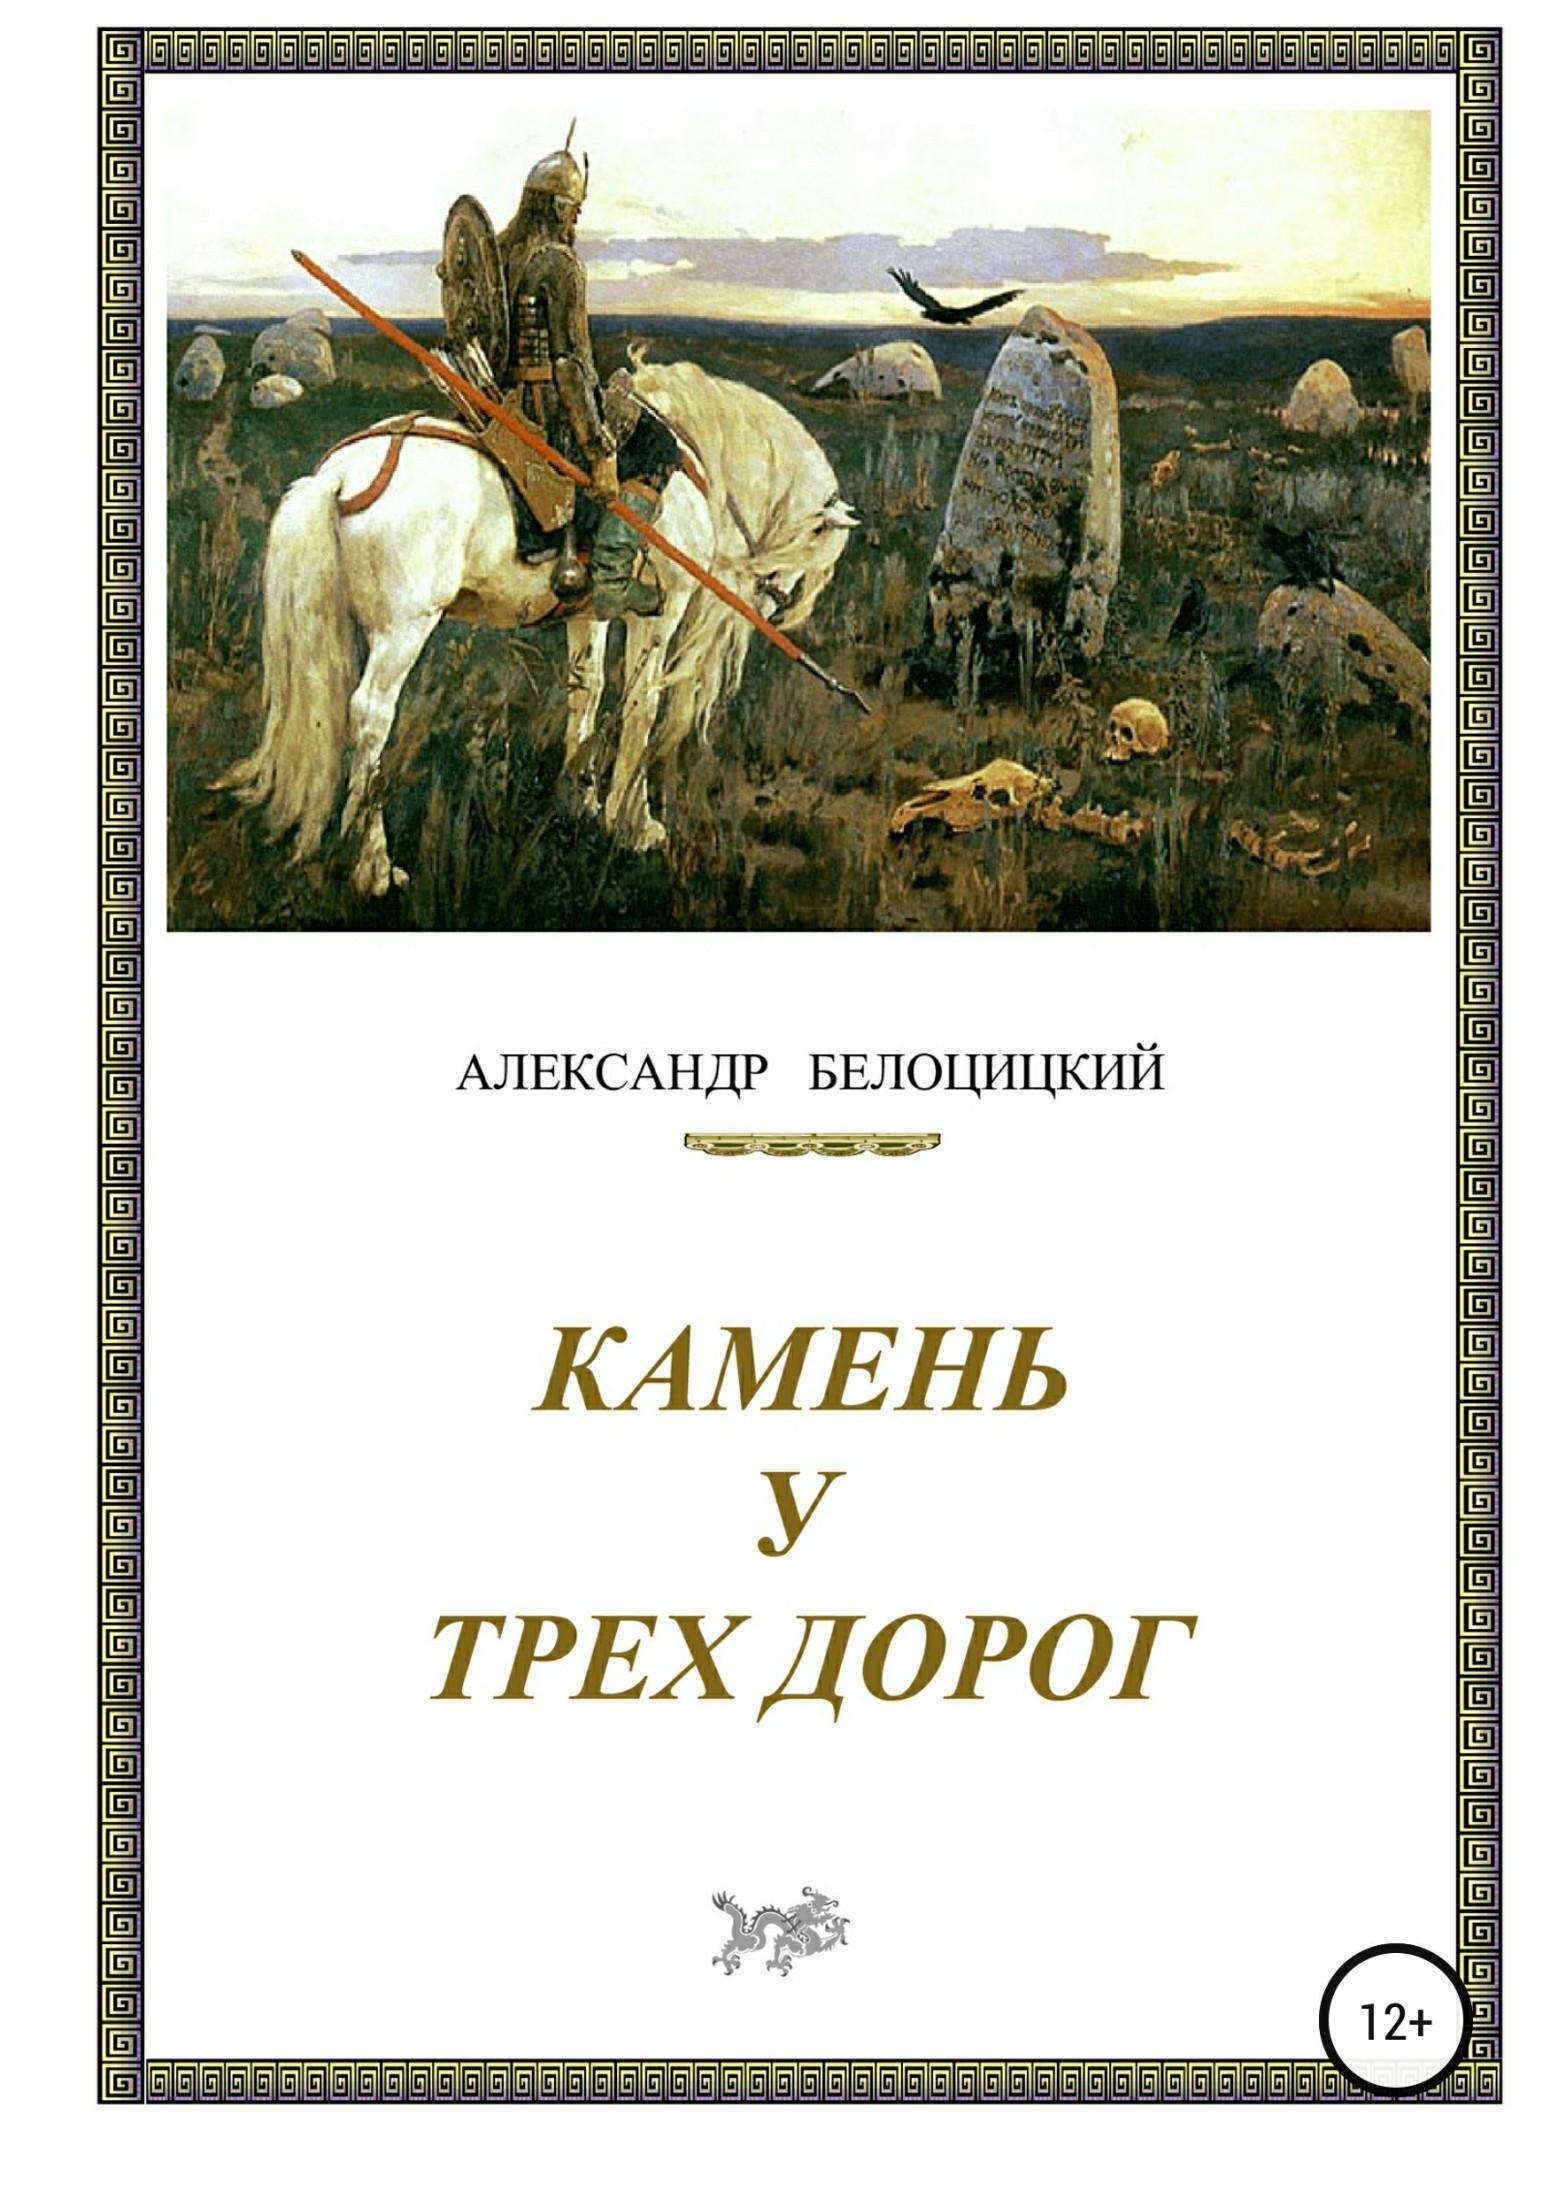 Александр Белоцицкий - Камень у трёх дорог